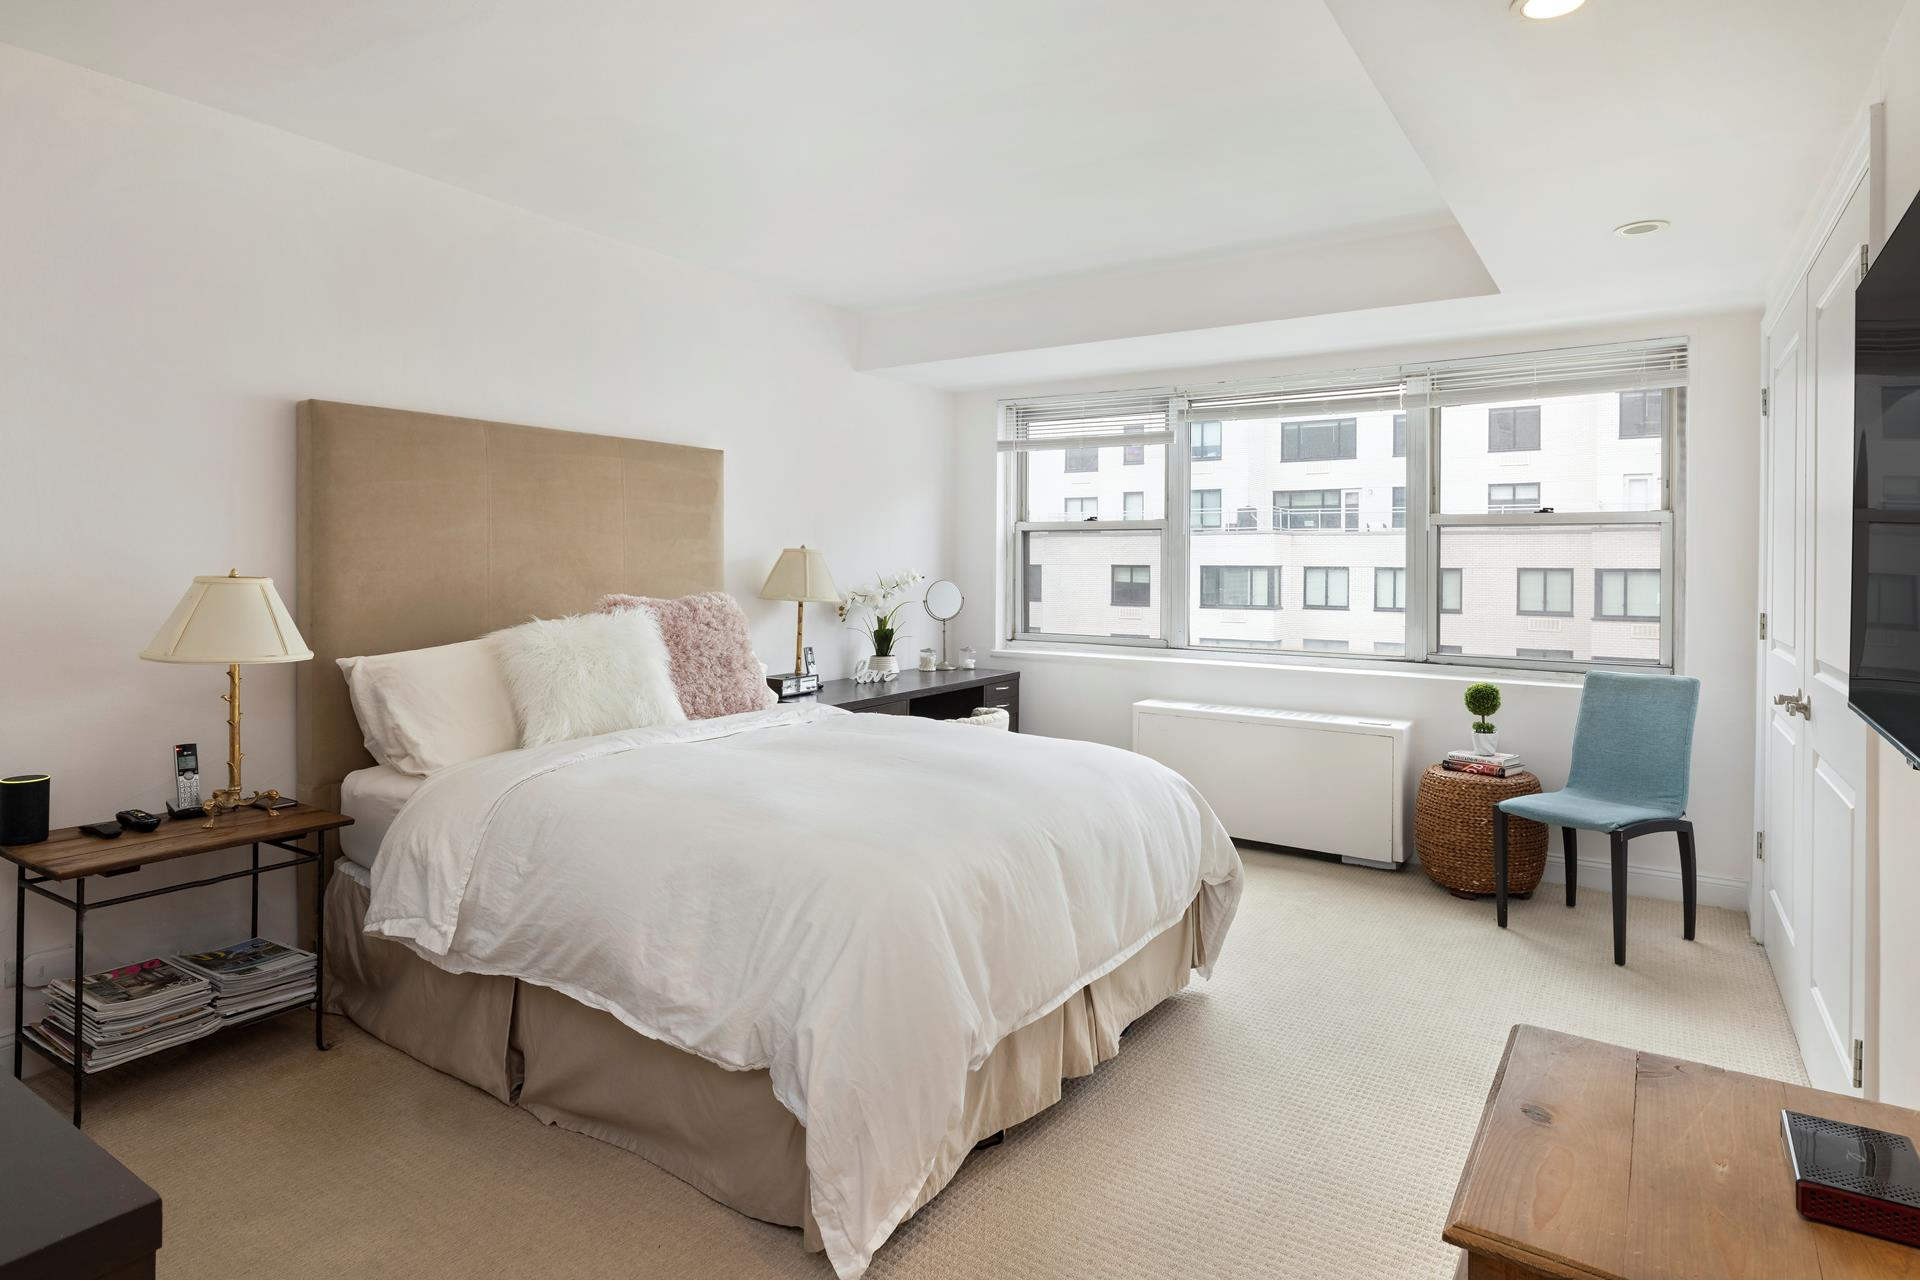 201 East 66th Street Upper East Side New York NY 10065